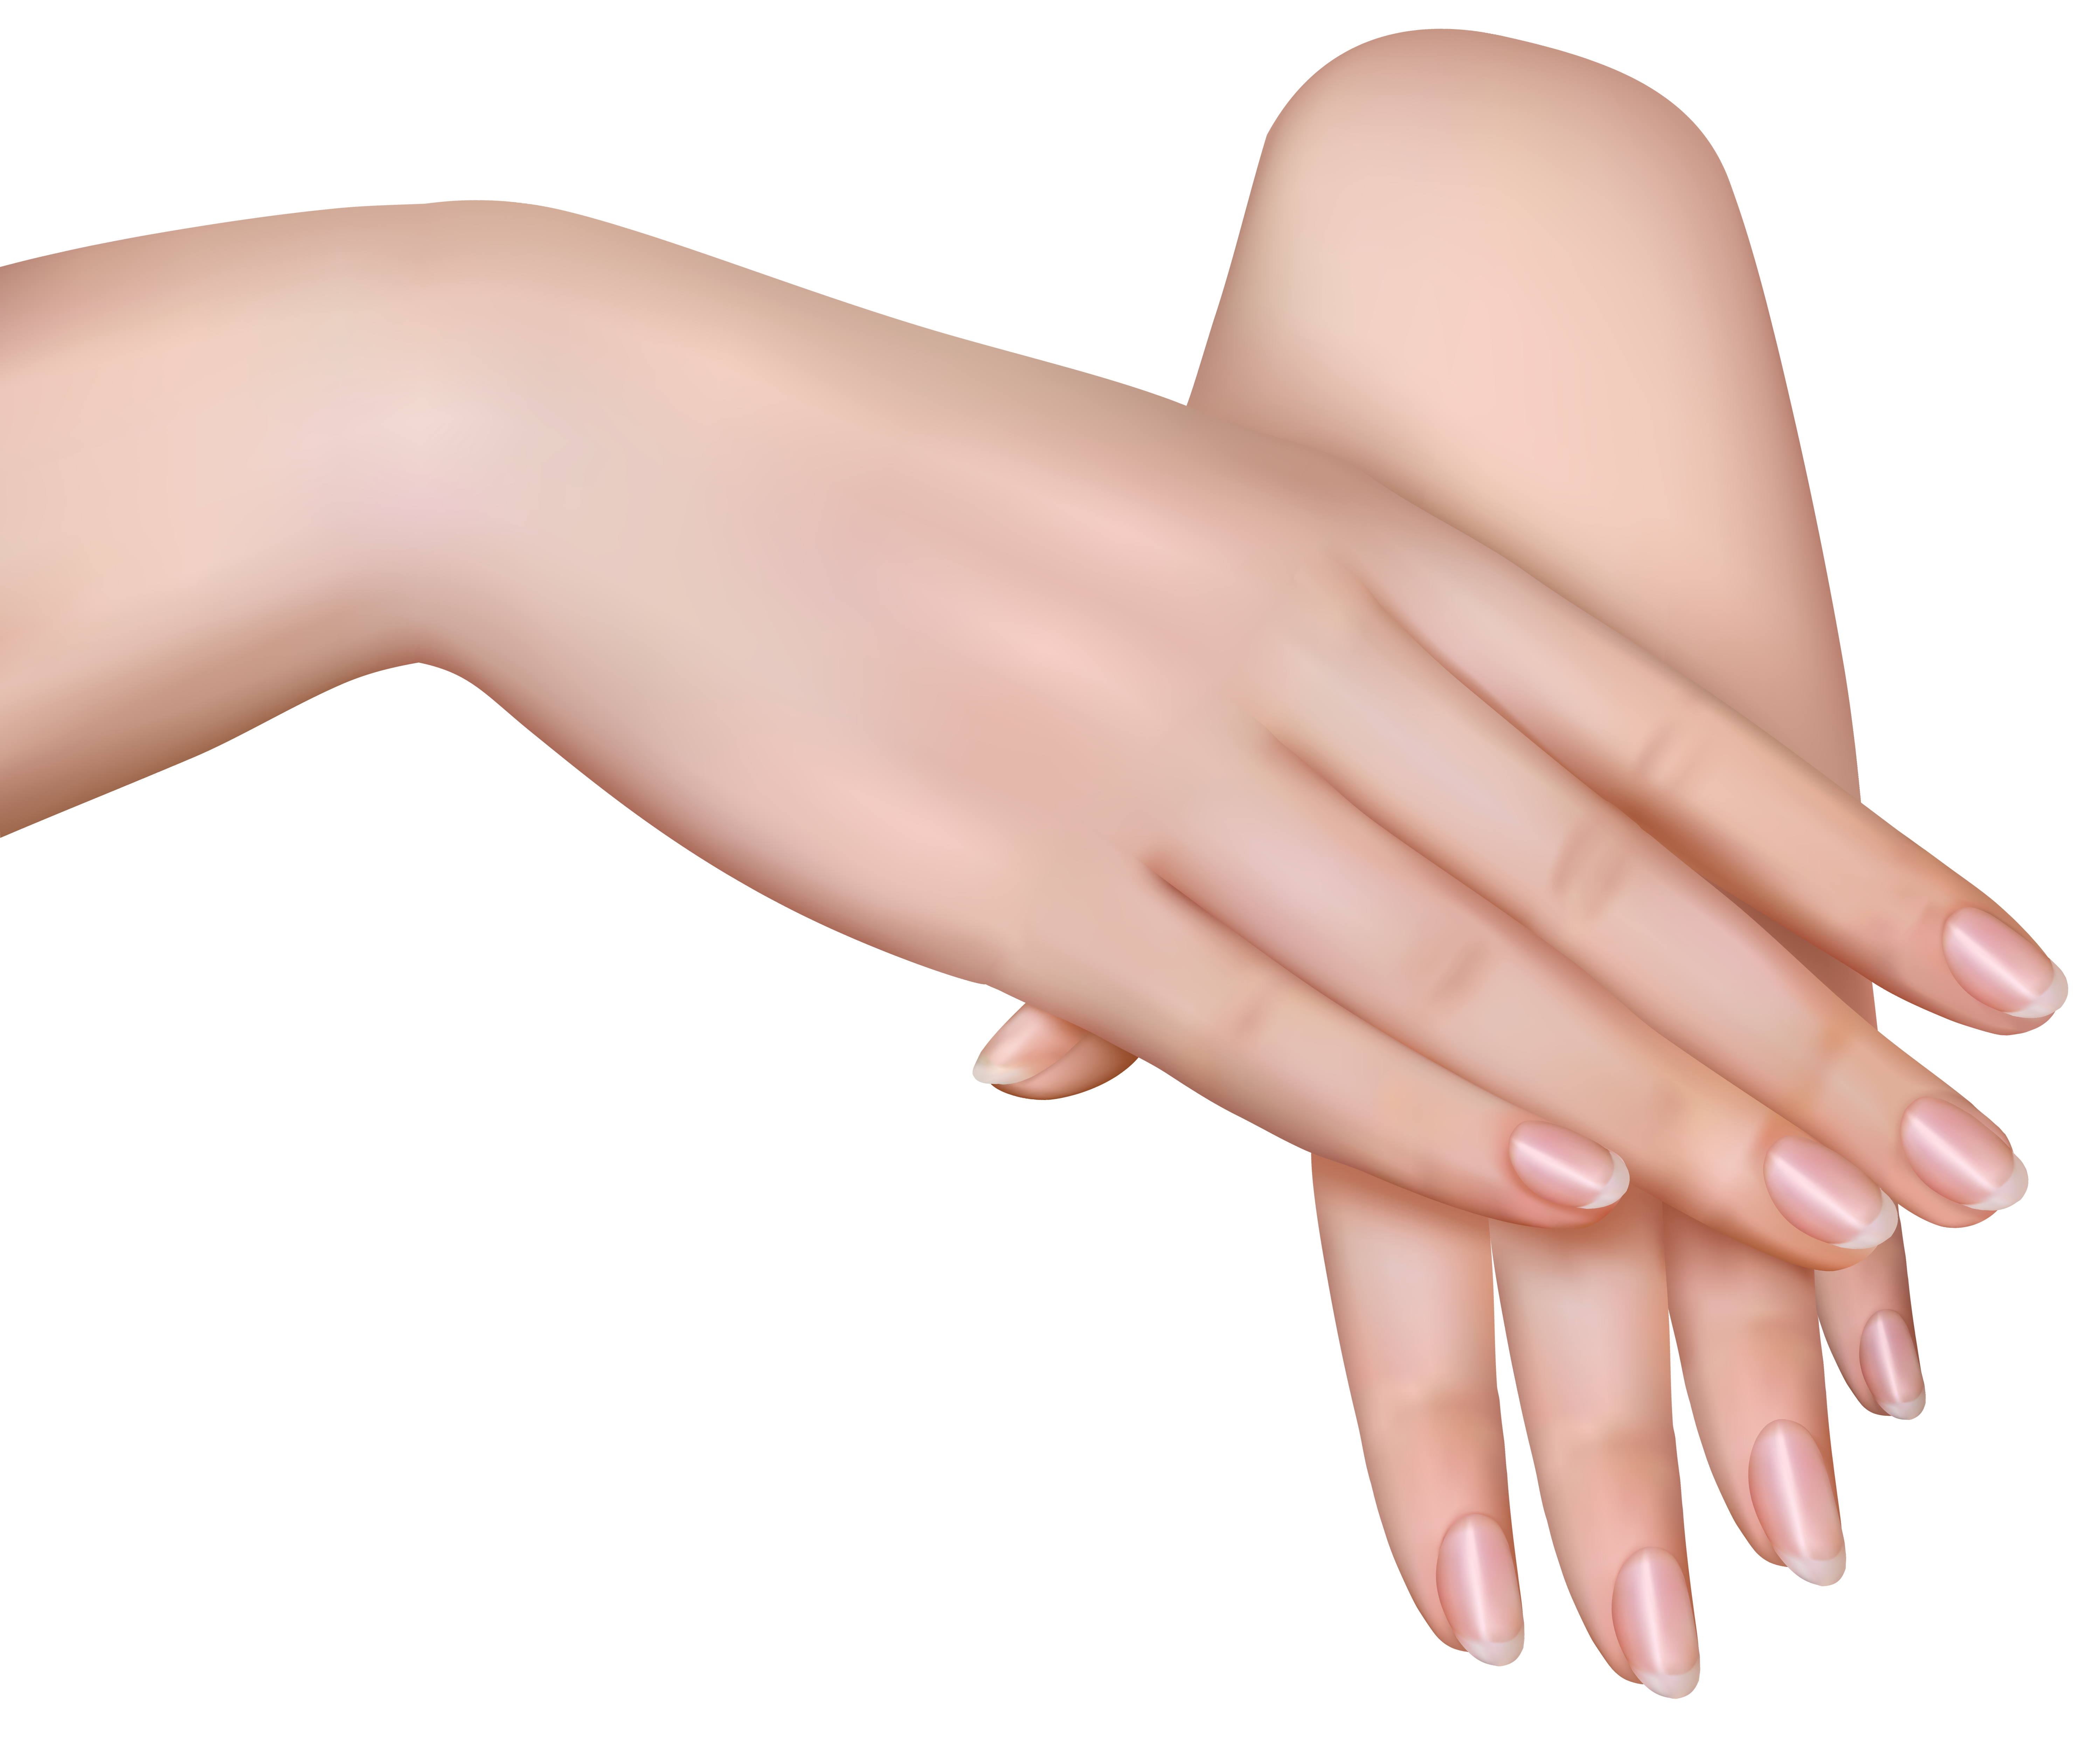 Nails clipart finger nail. Hand clip art female